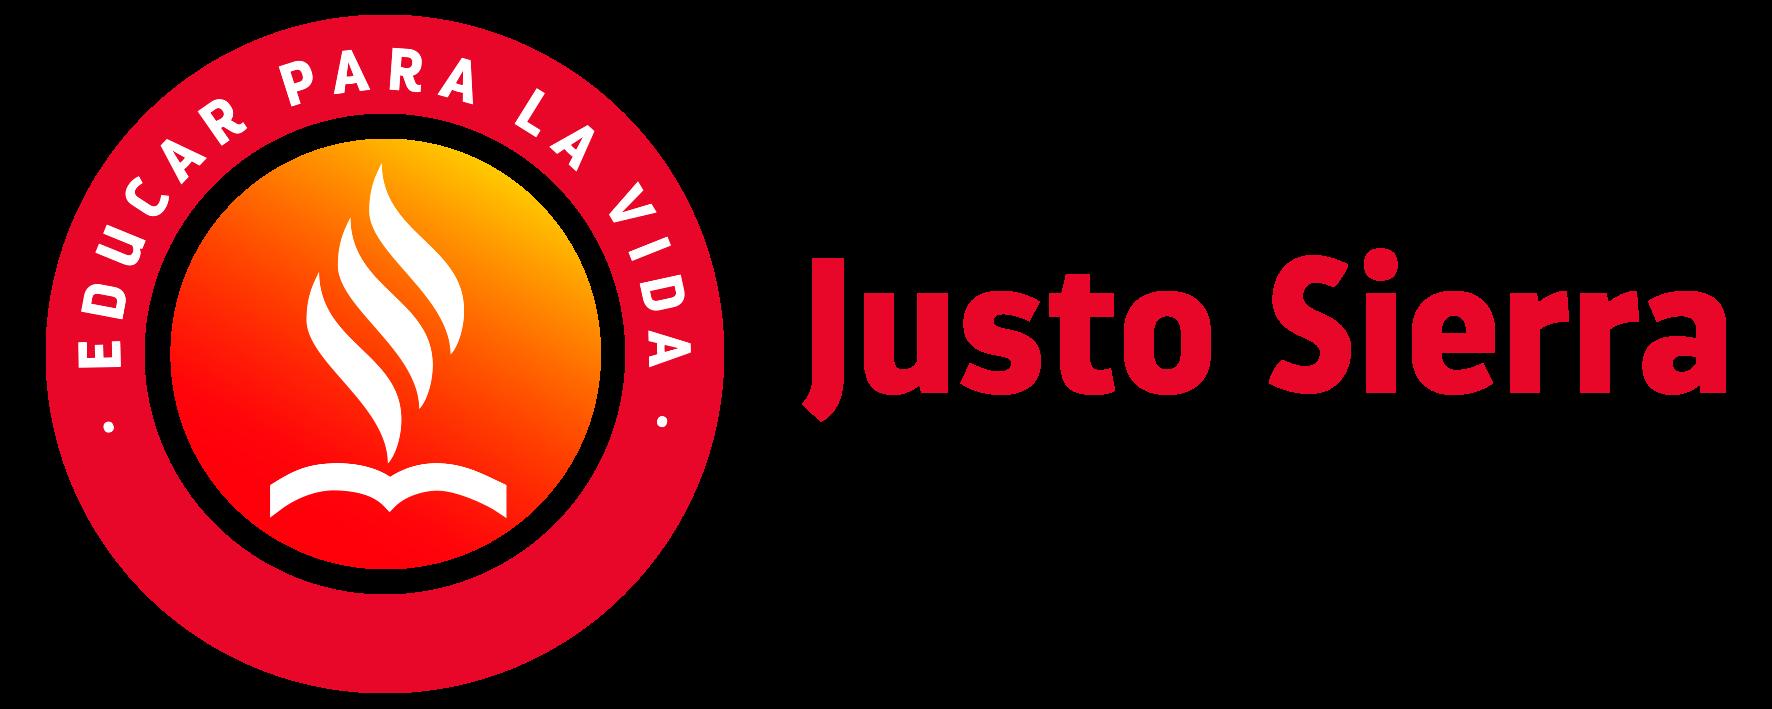 Justo Sierra